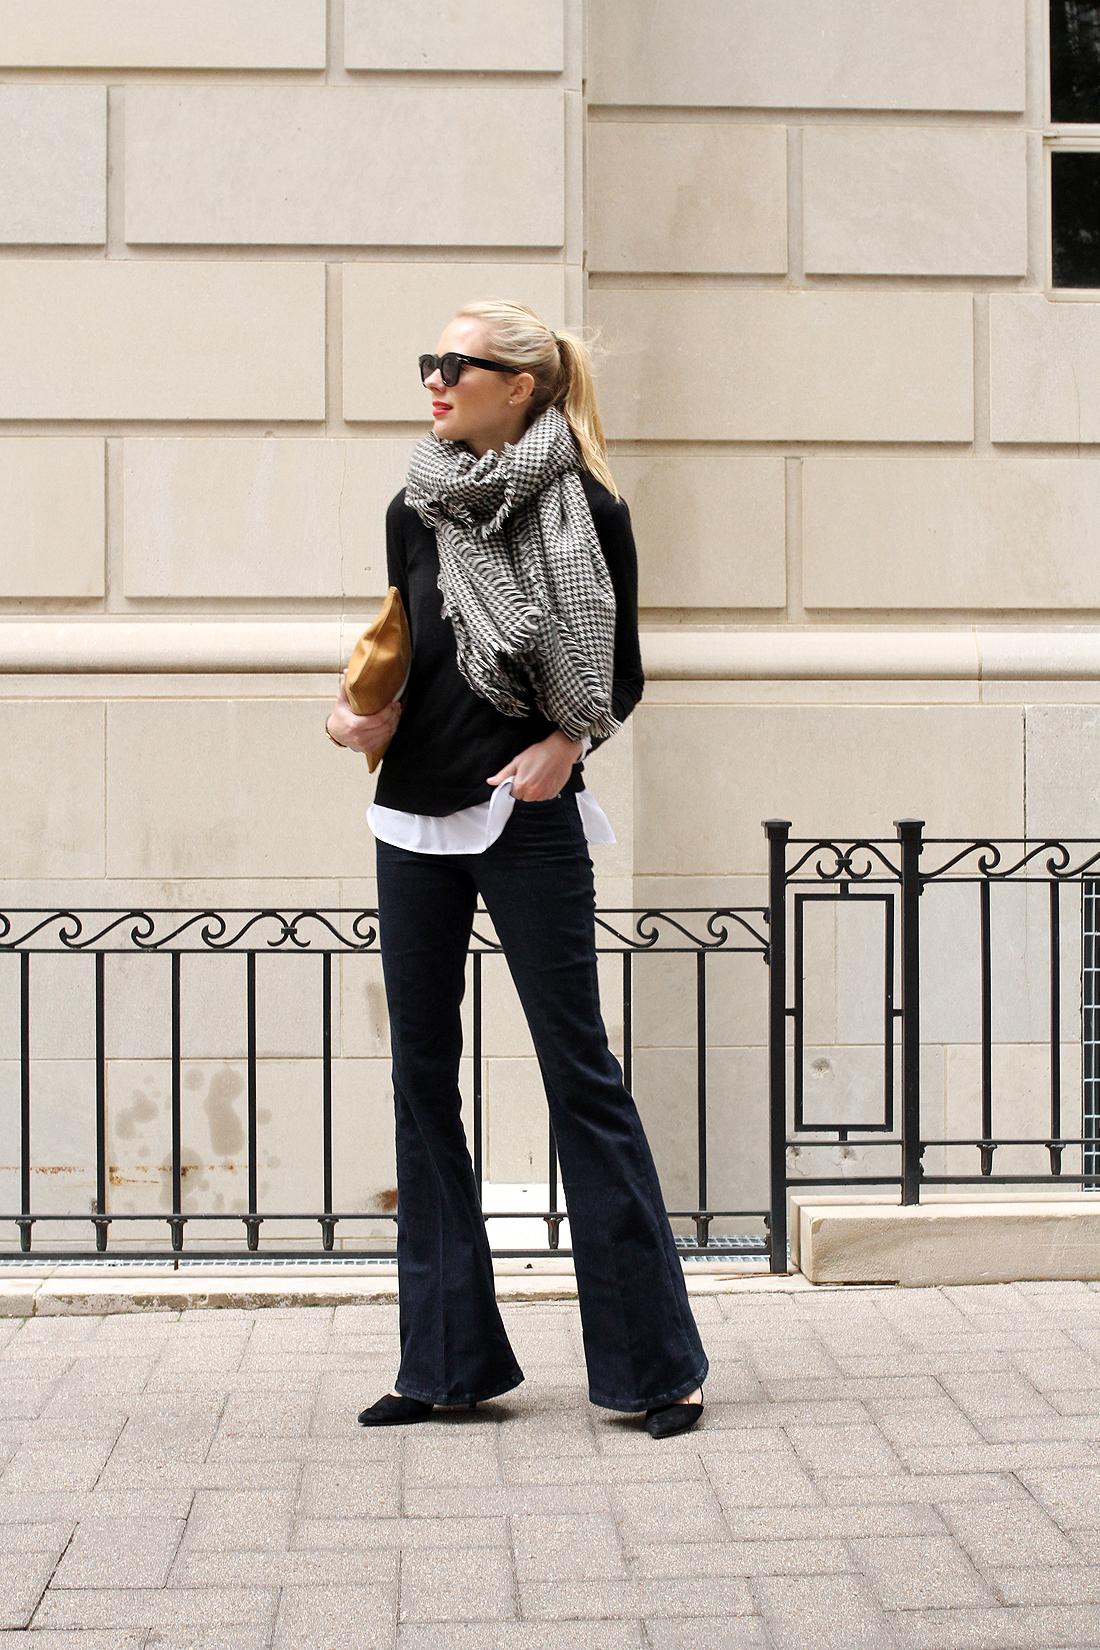 fashion-jackson-houndstooth-scarf-denim-flare-jeans-black-sweater-black-pumps-celine-sunglasses